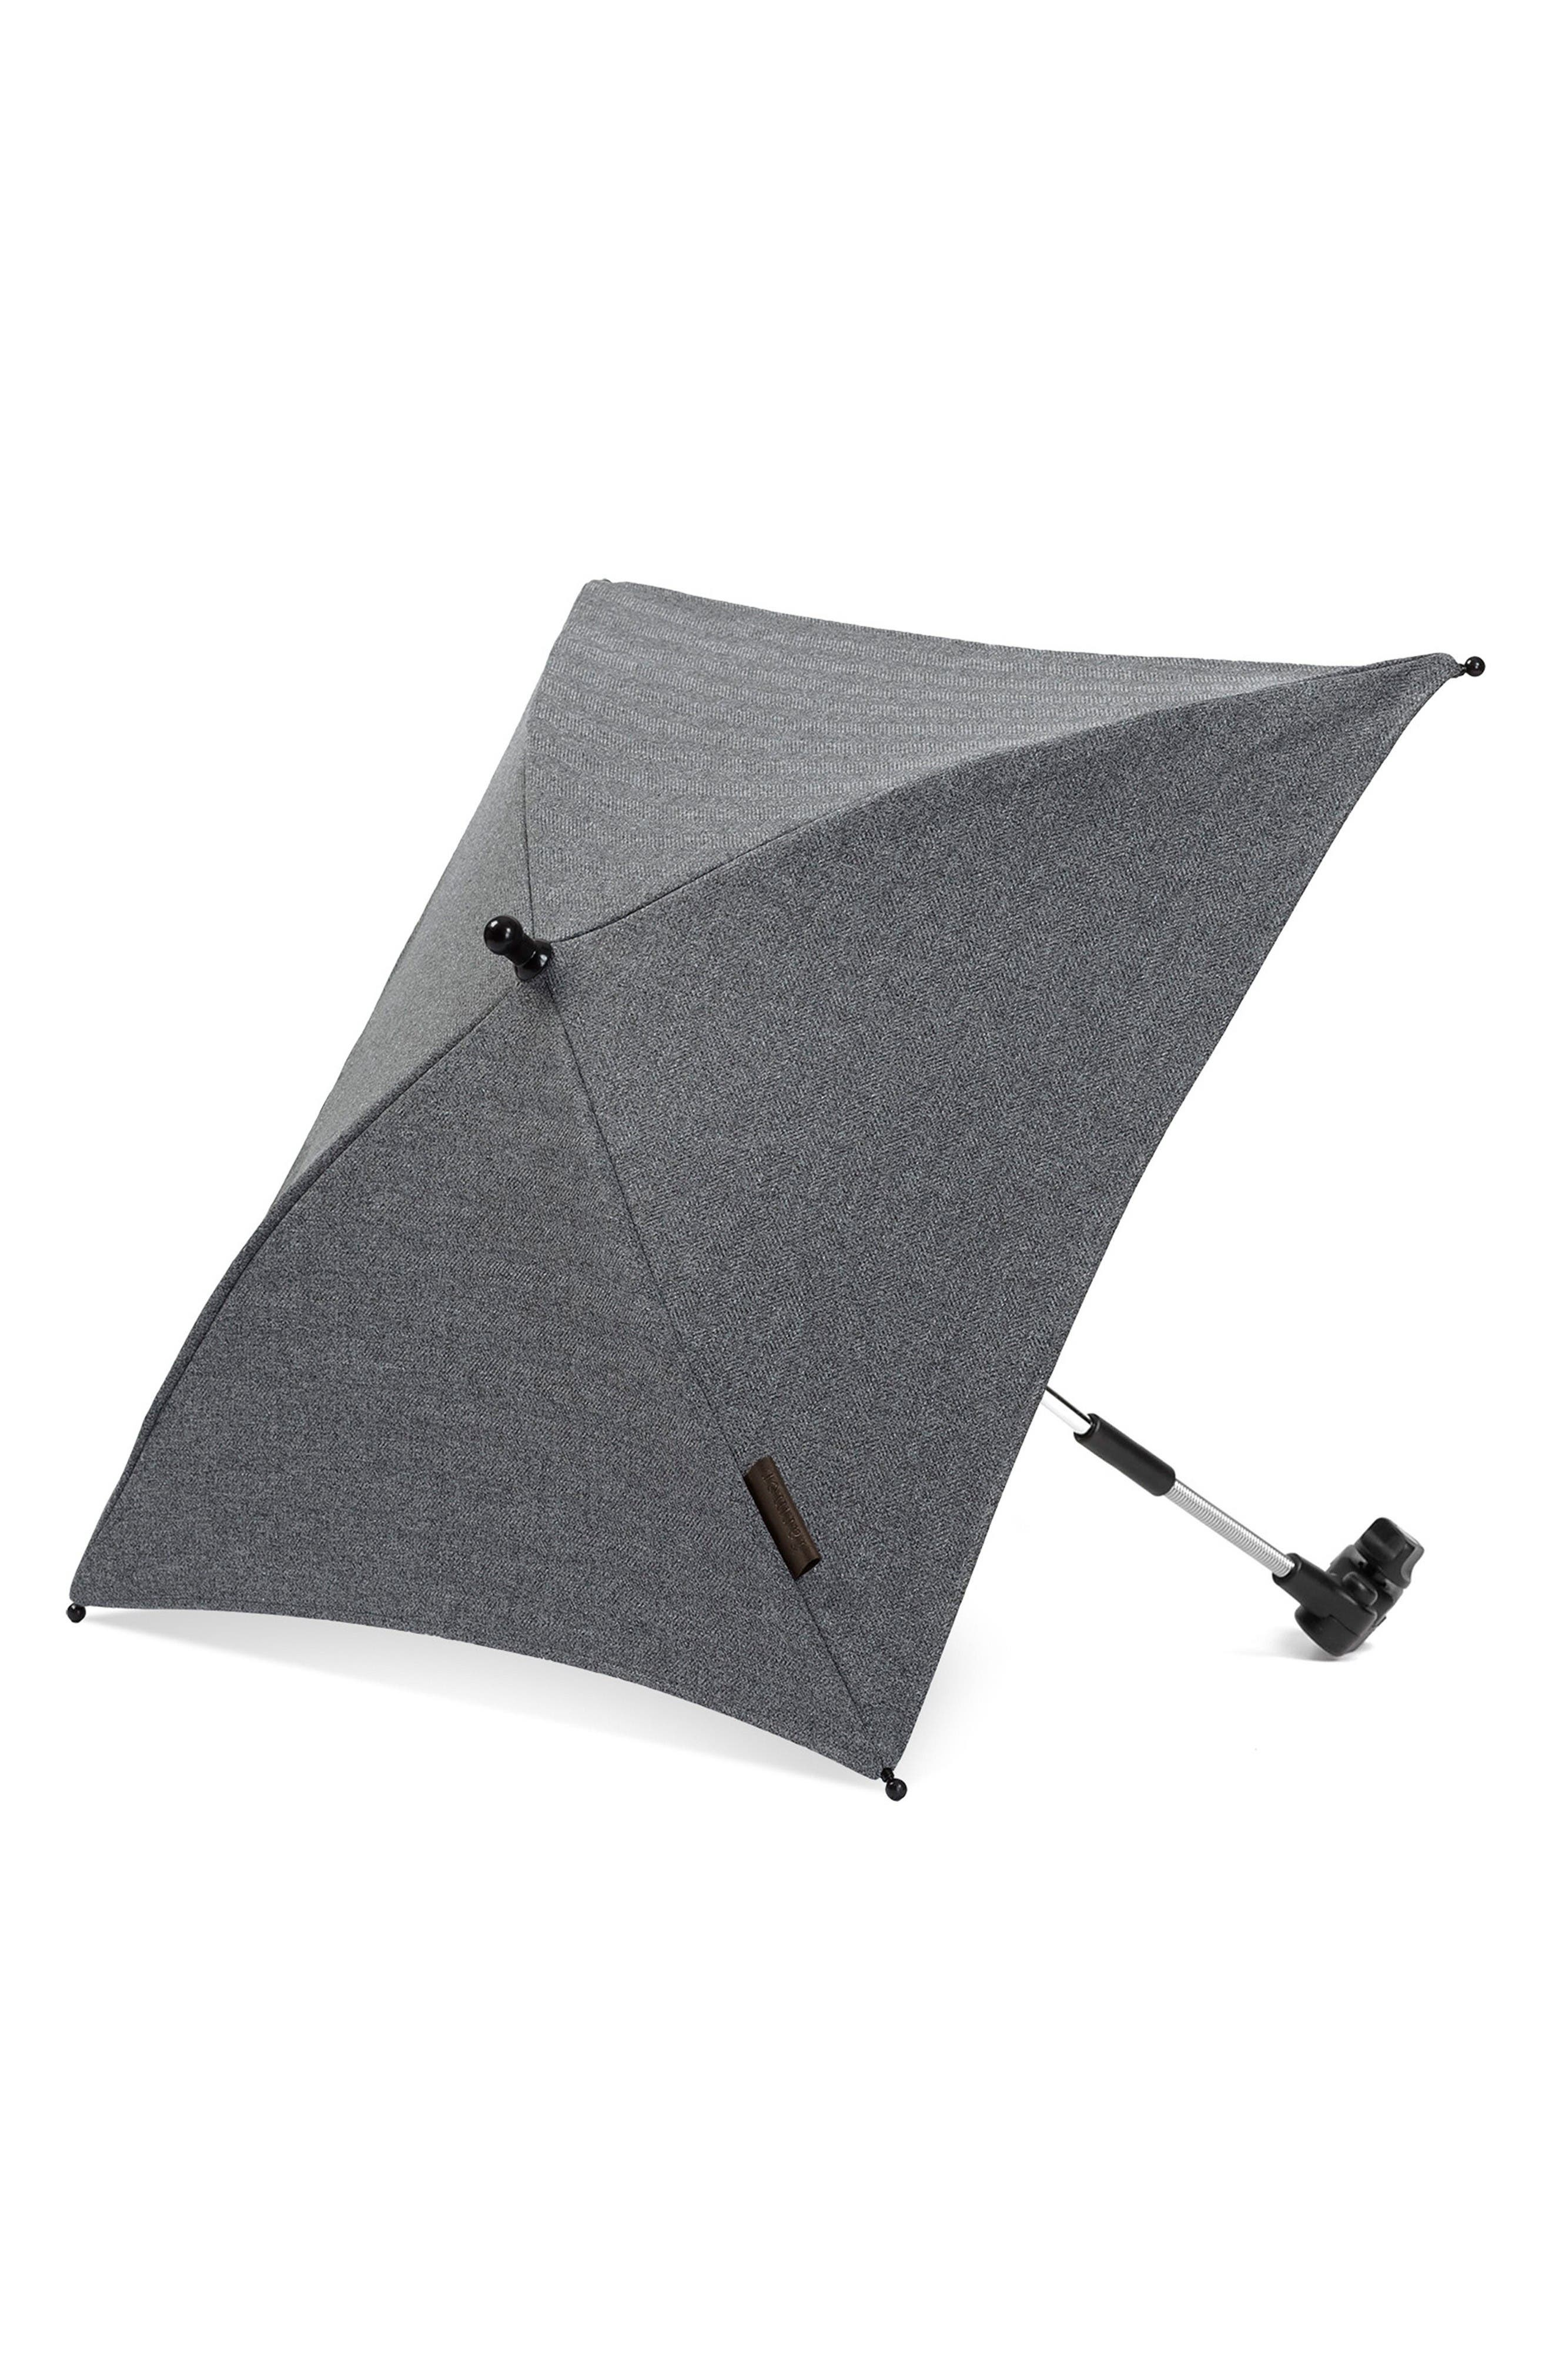 Mutsy Evo - Farmer Stroller Umbrella